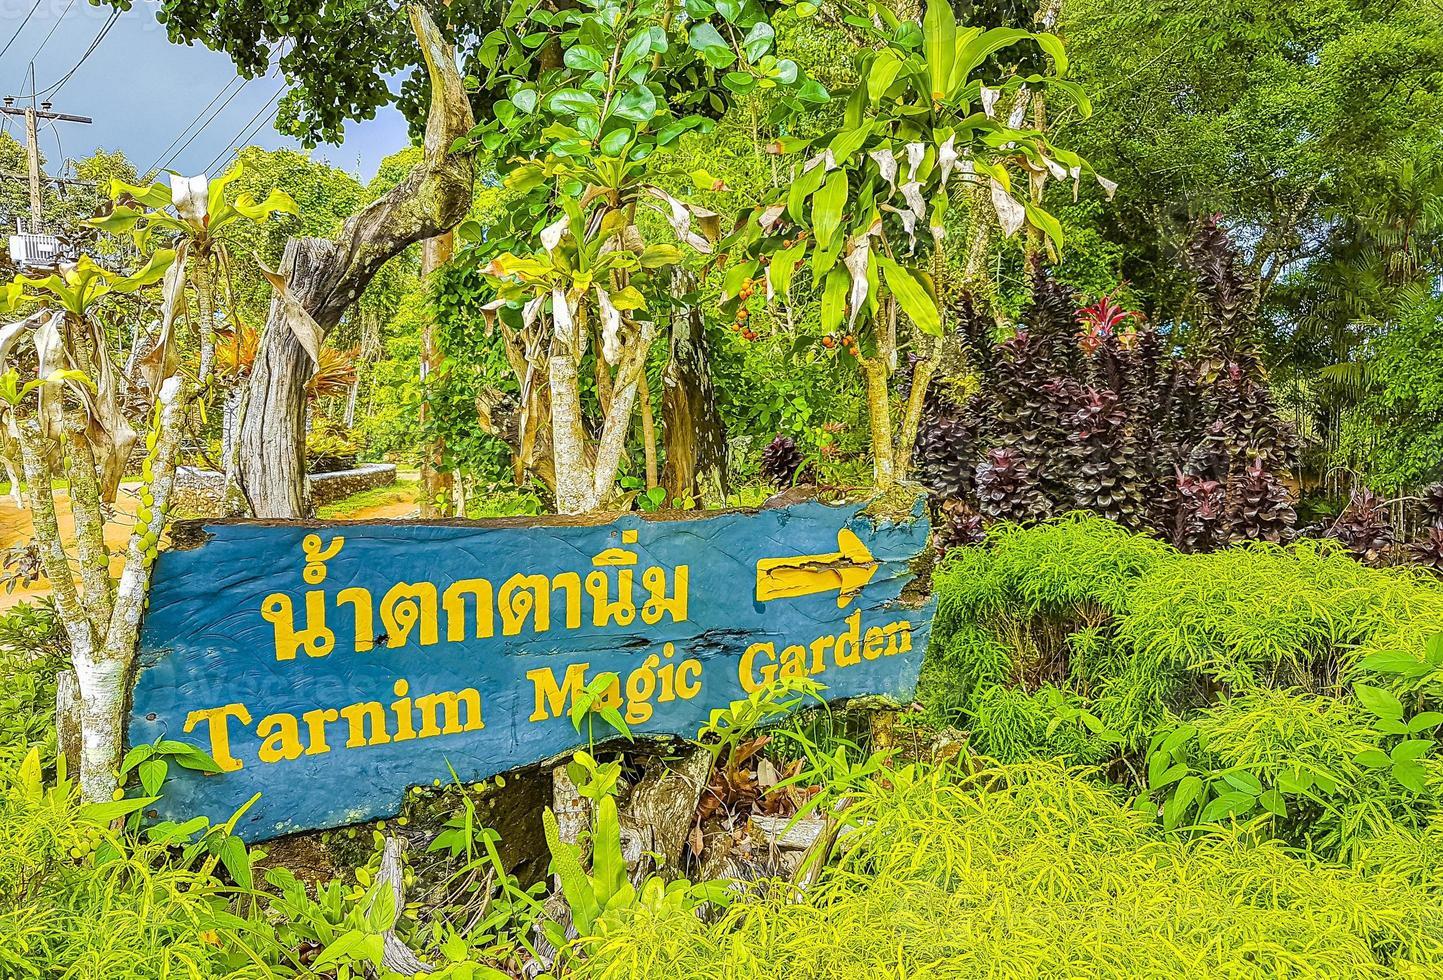 panneau de direction jardin magique de tarnim et cascade koh samui en thaïlande. photo